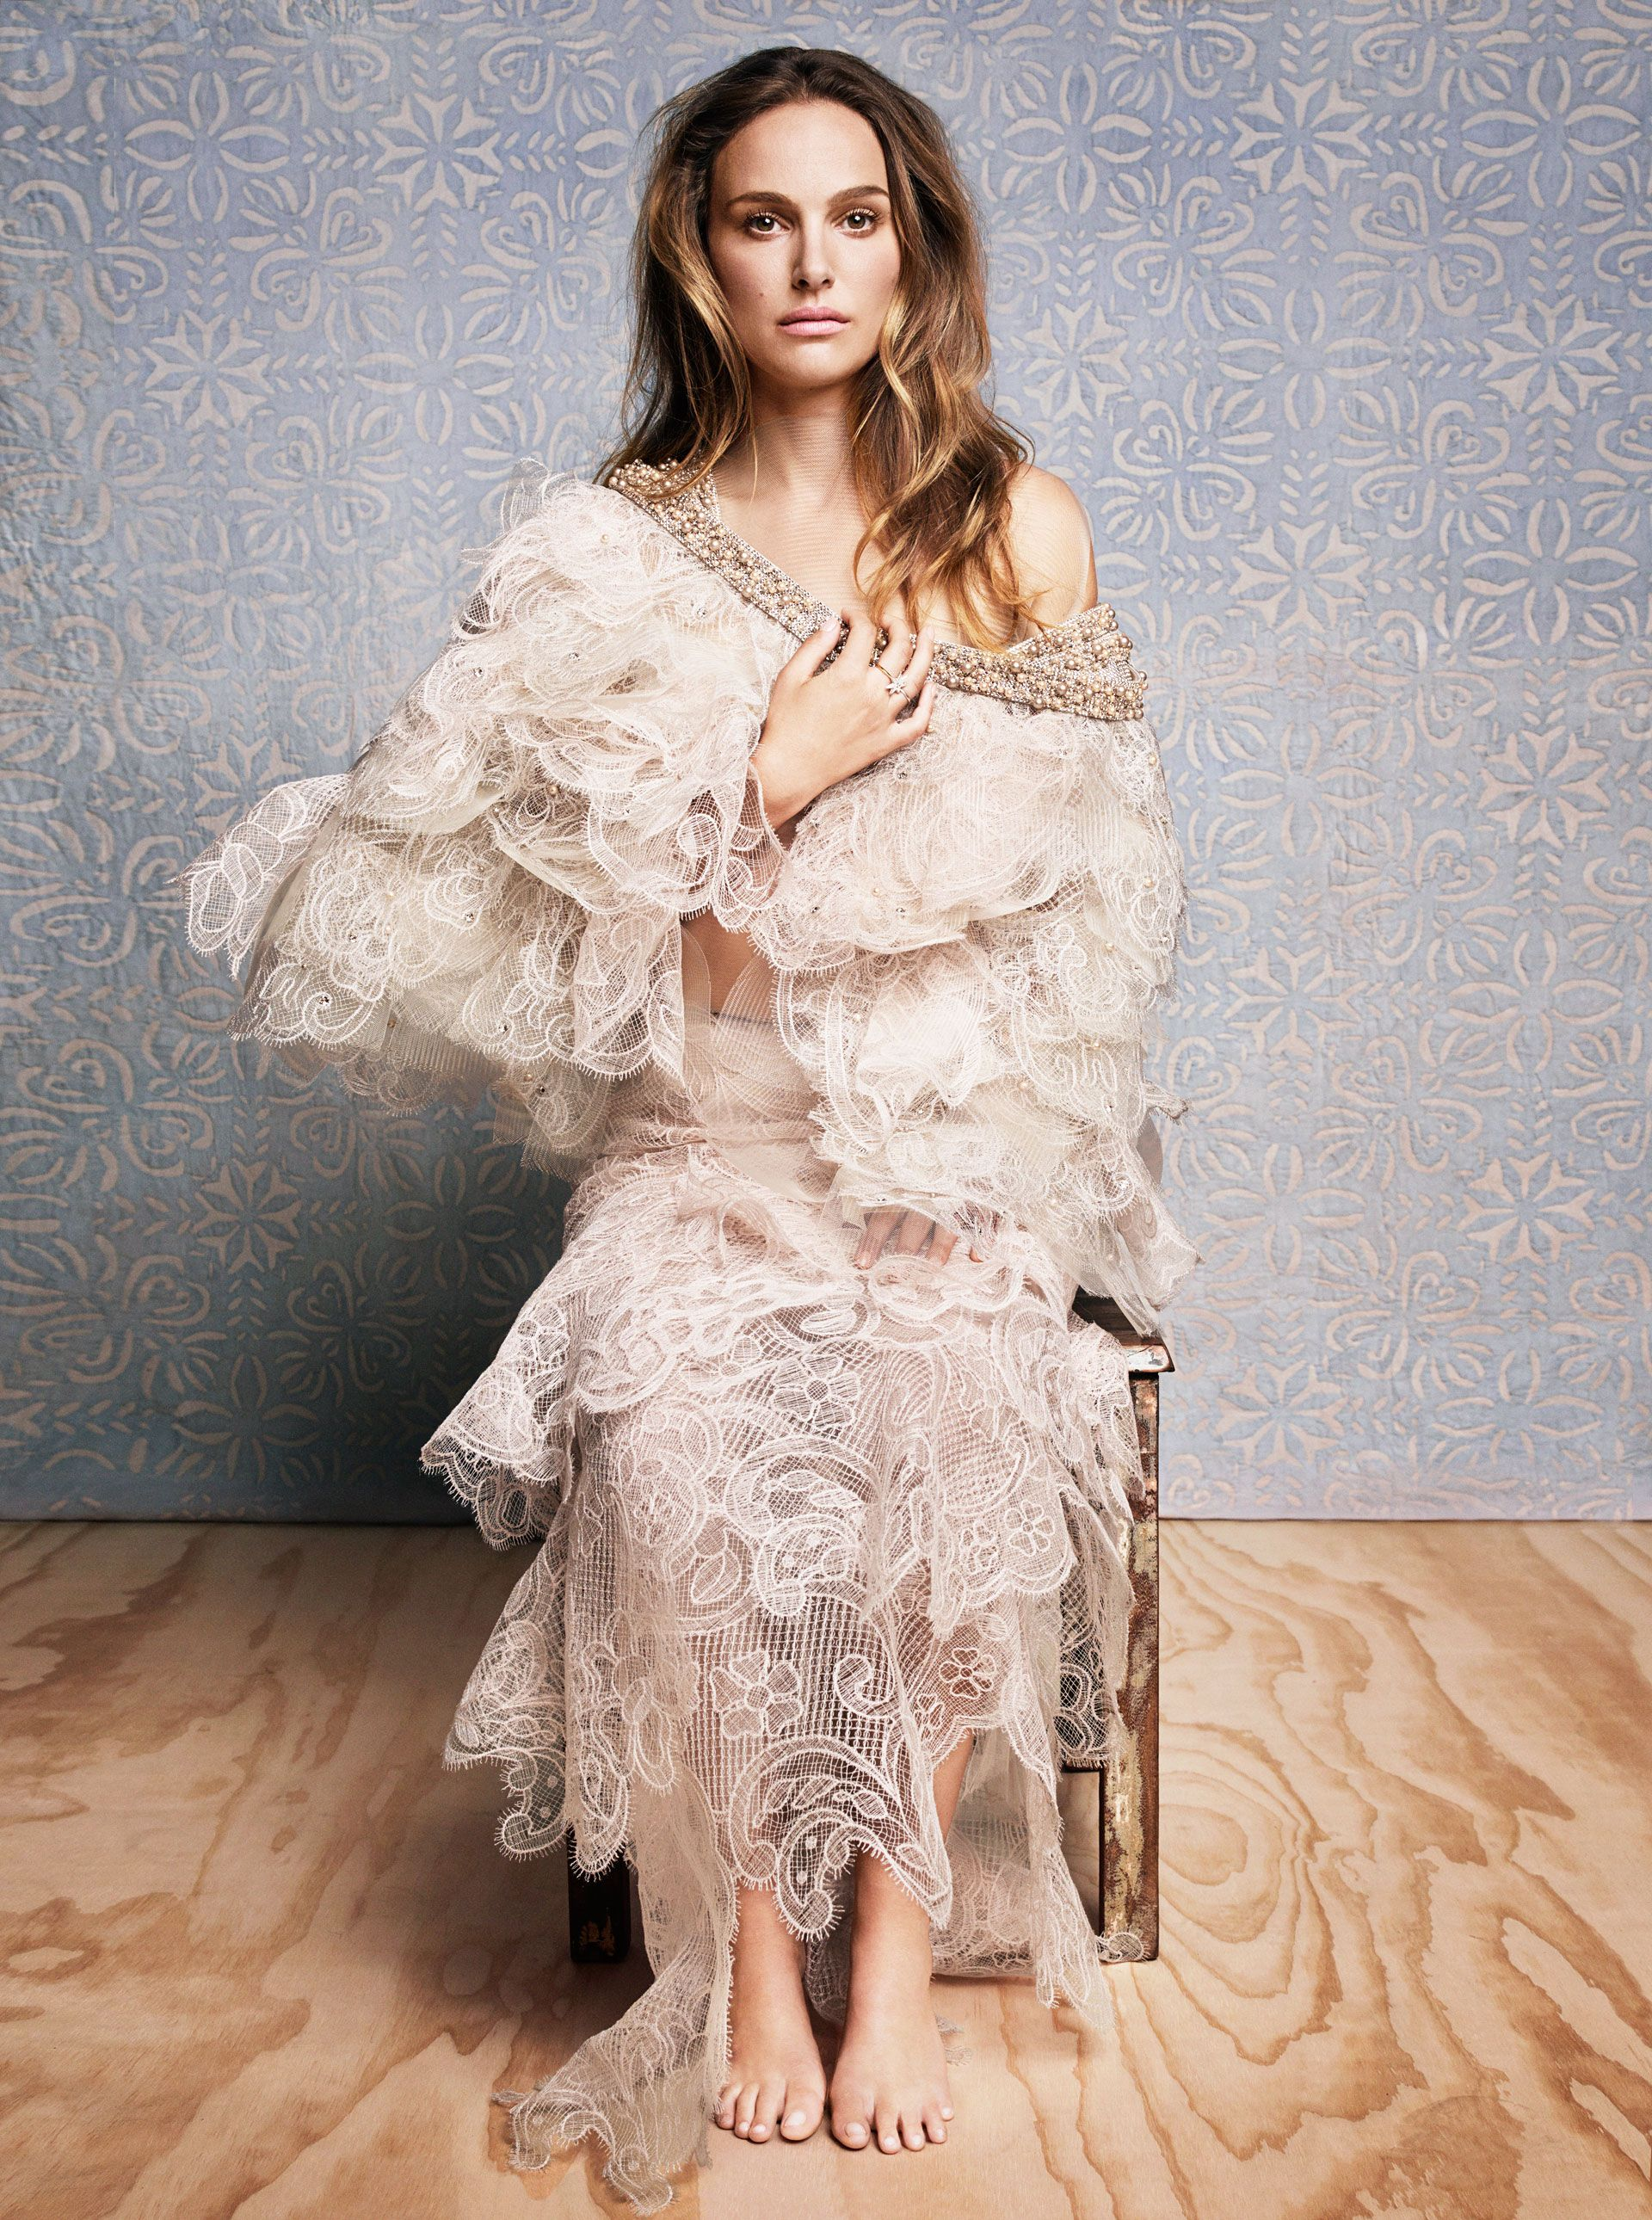 Forum on this topic: Natalie Portman: The Fashion Shoot, natalie-portman-the-fashion-shoot/